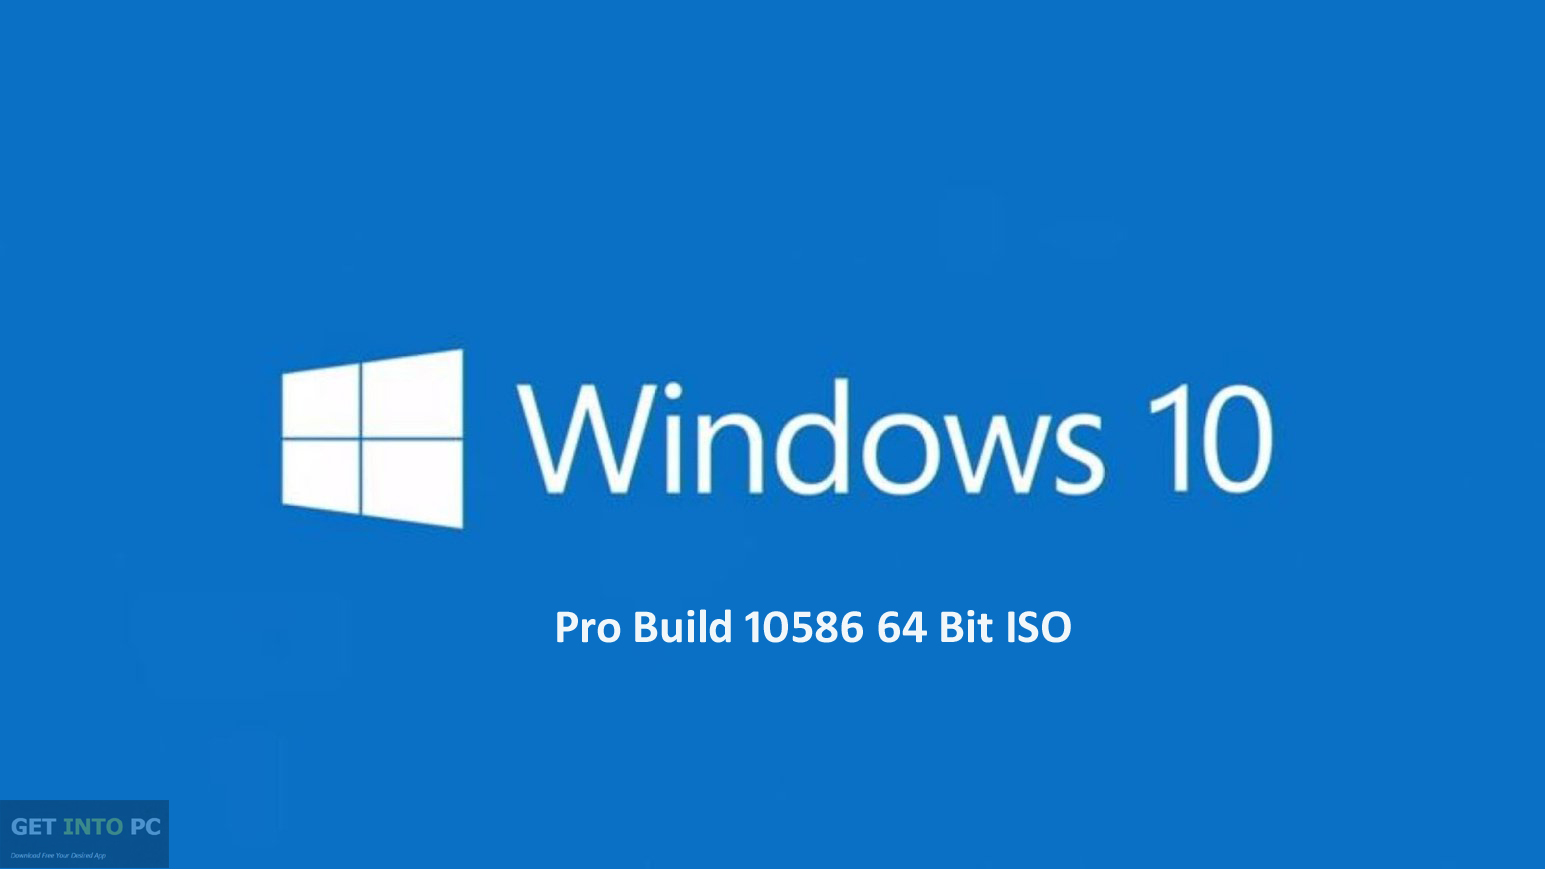 download win 10 pro 64bit